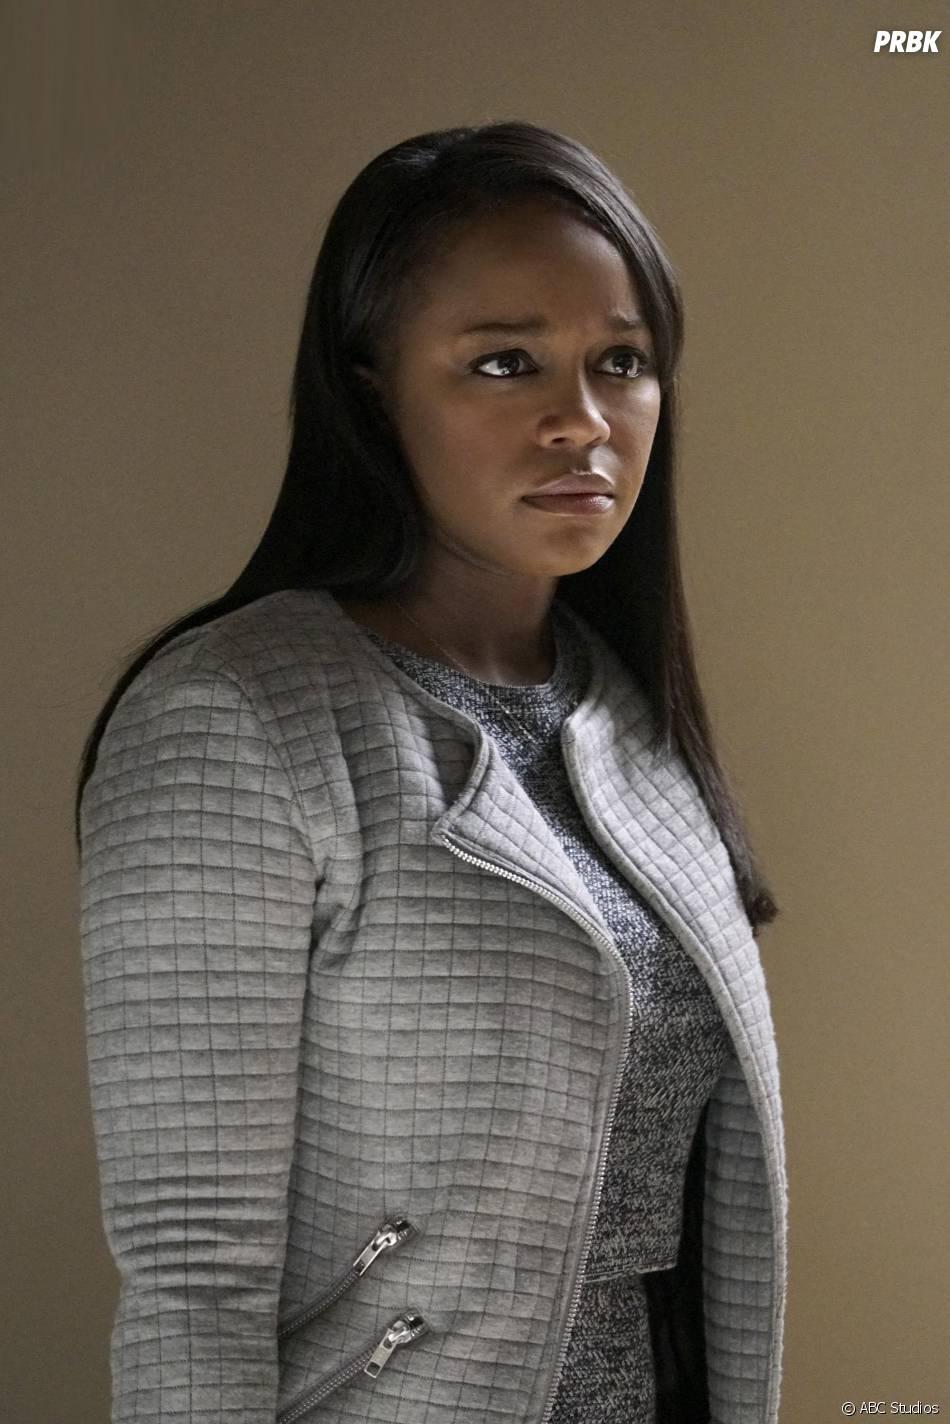 How To Get Away With Murder saison 2, épisode 11 : Michaela (Aja Naomi King) sur une photo